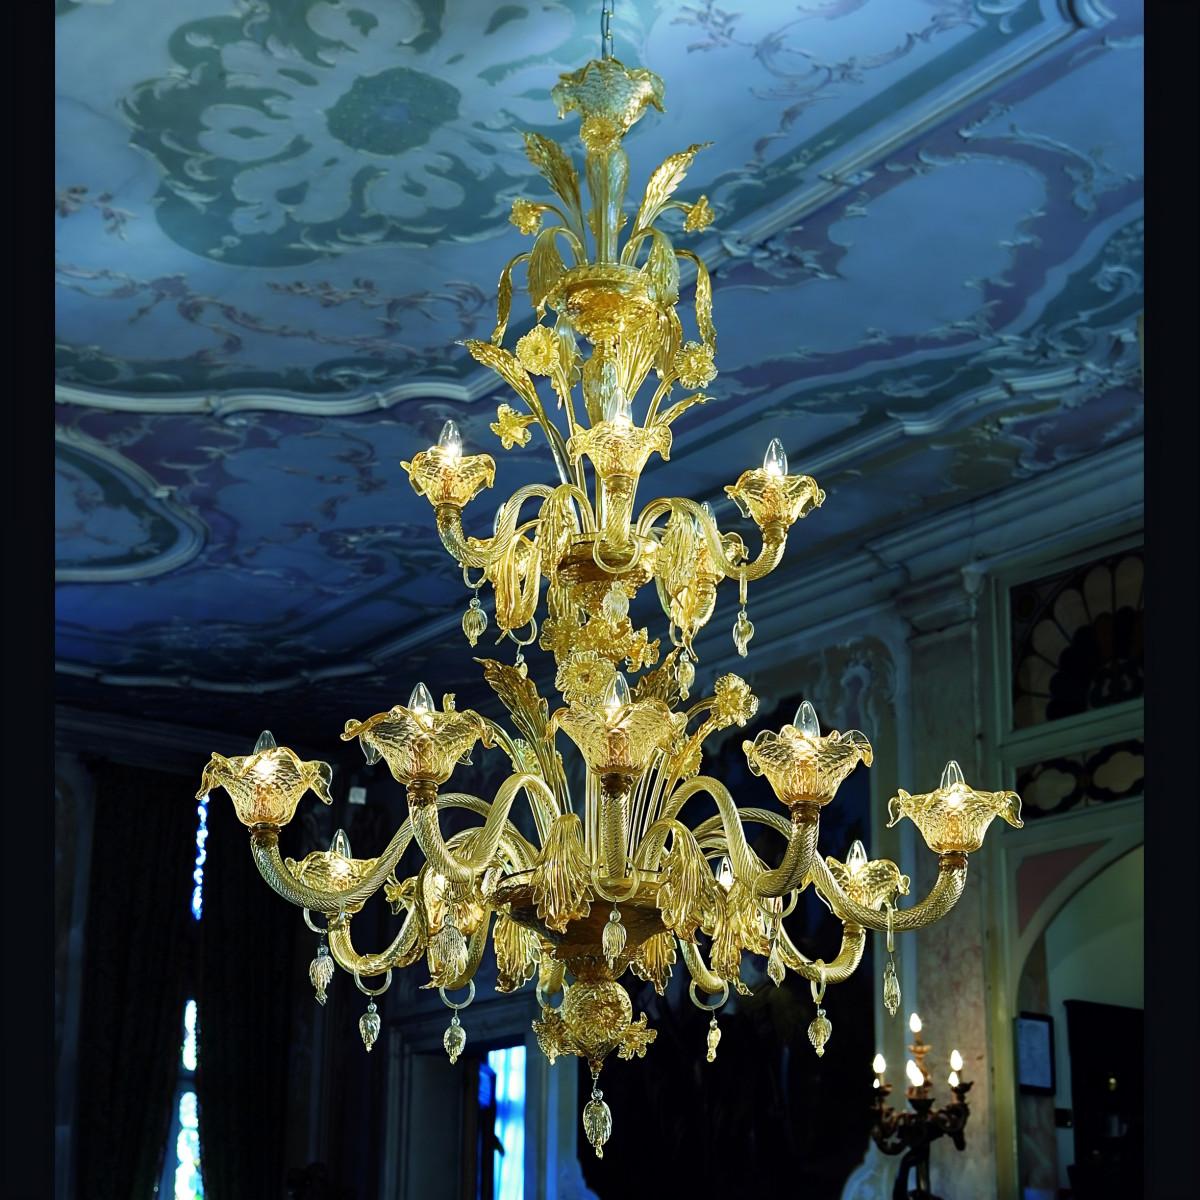 """Artemisia"" Murano glass chandelier - 10+5 lights - amber gold color"